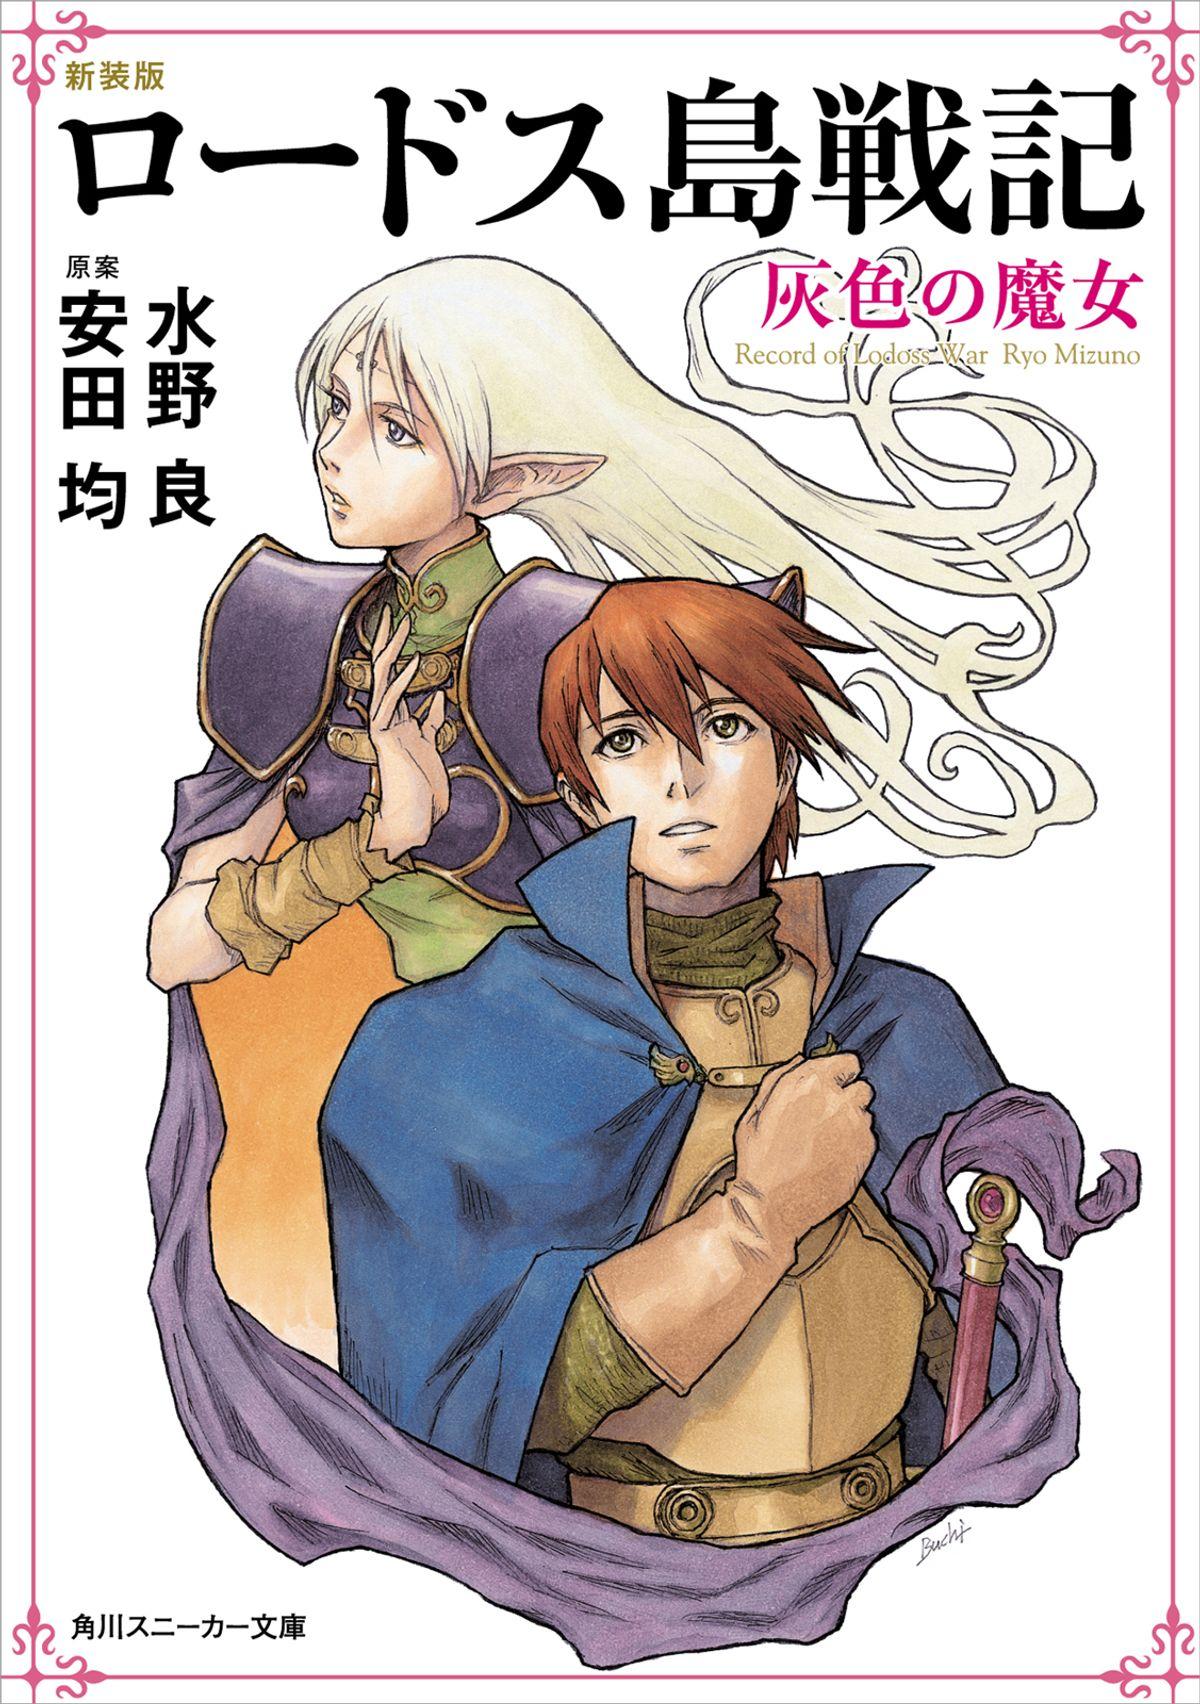 Novel Lodoss War será publicada pela editora NewPop